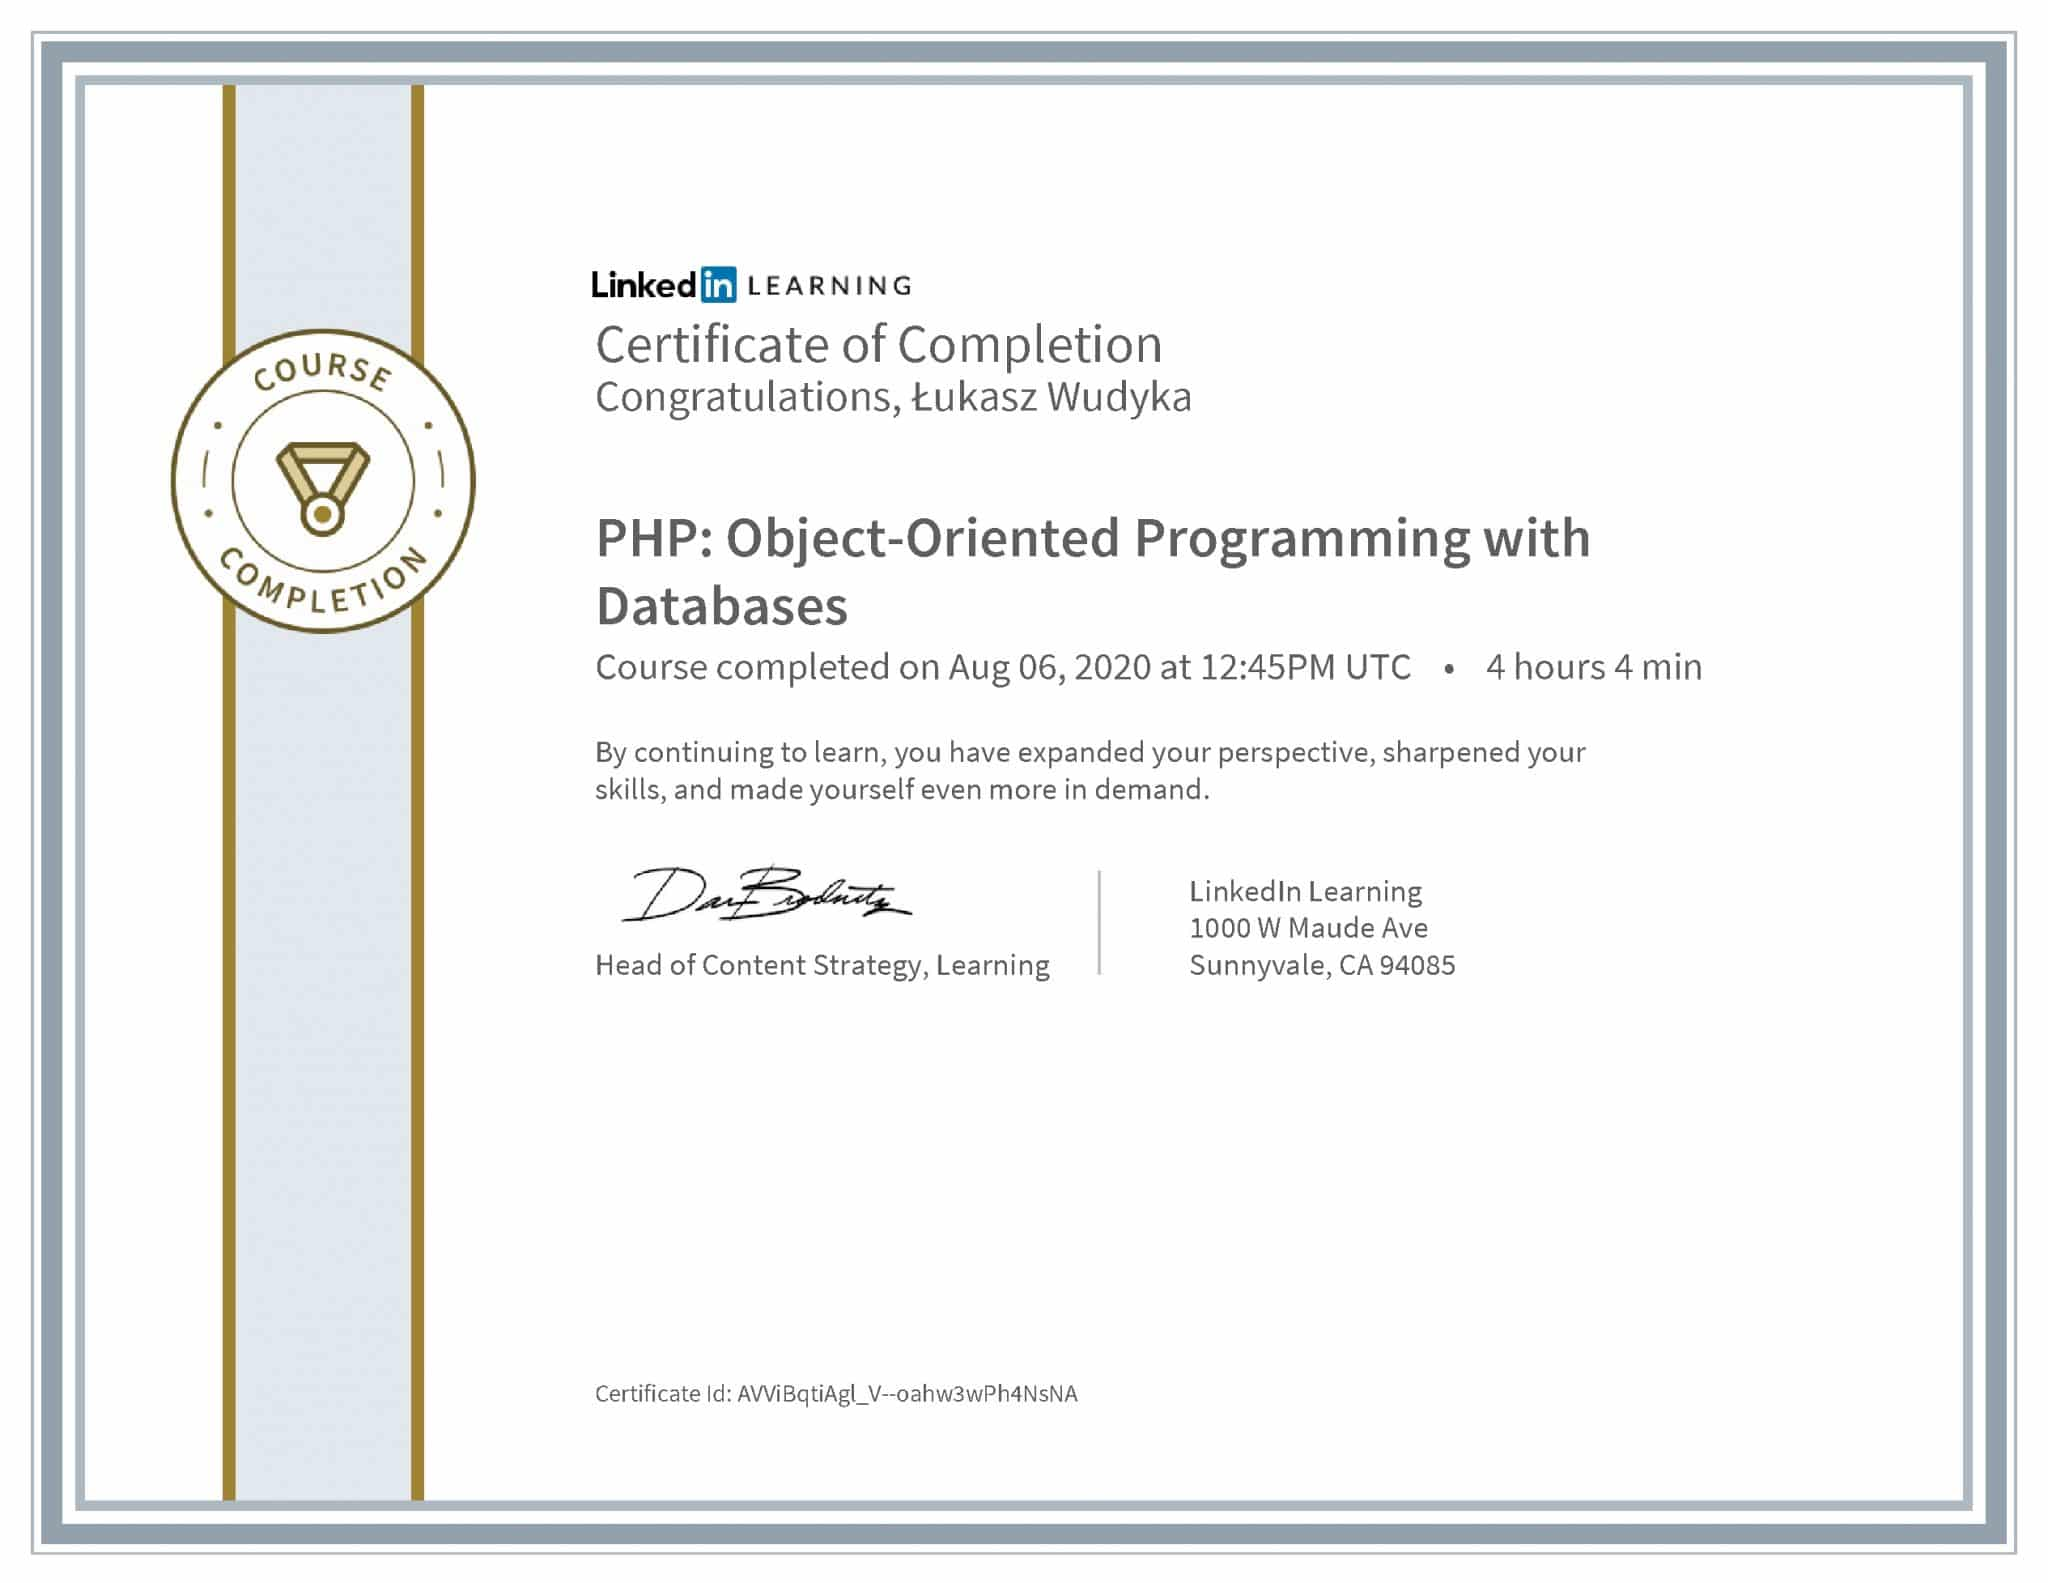 Łukasz Wudyka certyfikat LinkedIn PHP: Object-Oriented Programming with Databases